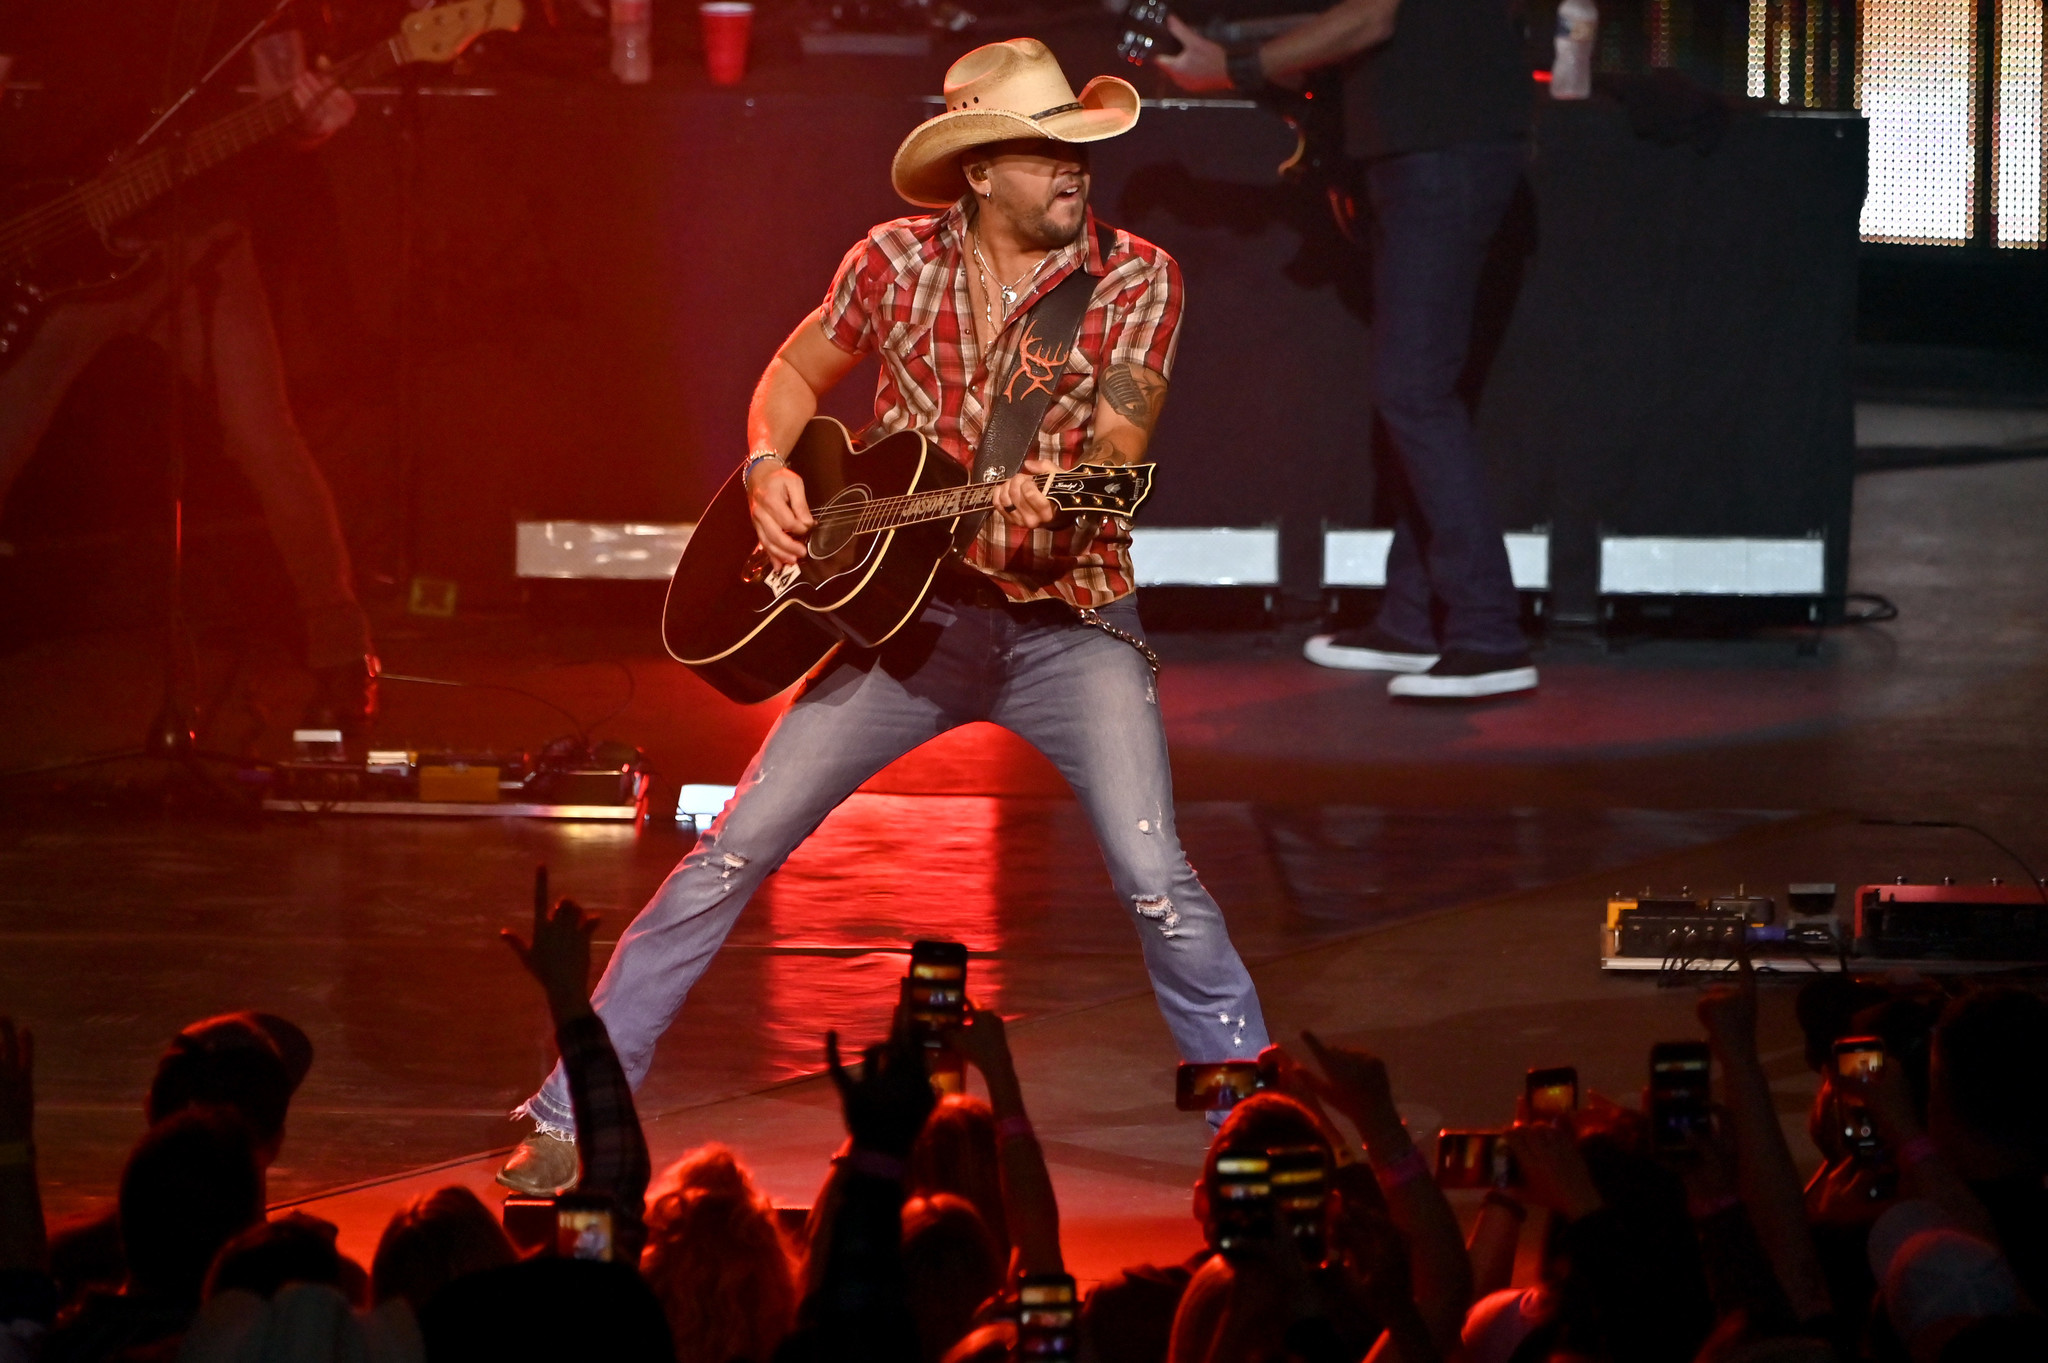 Jason Aldean plays first Las Vegas concert since 2017 shooting